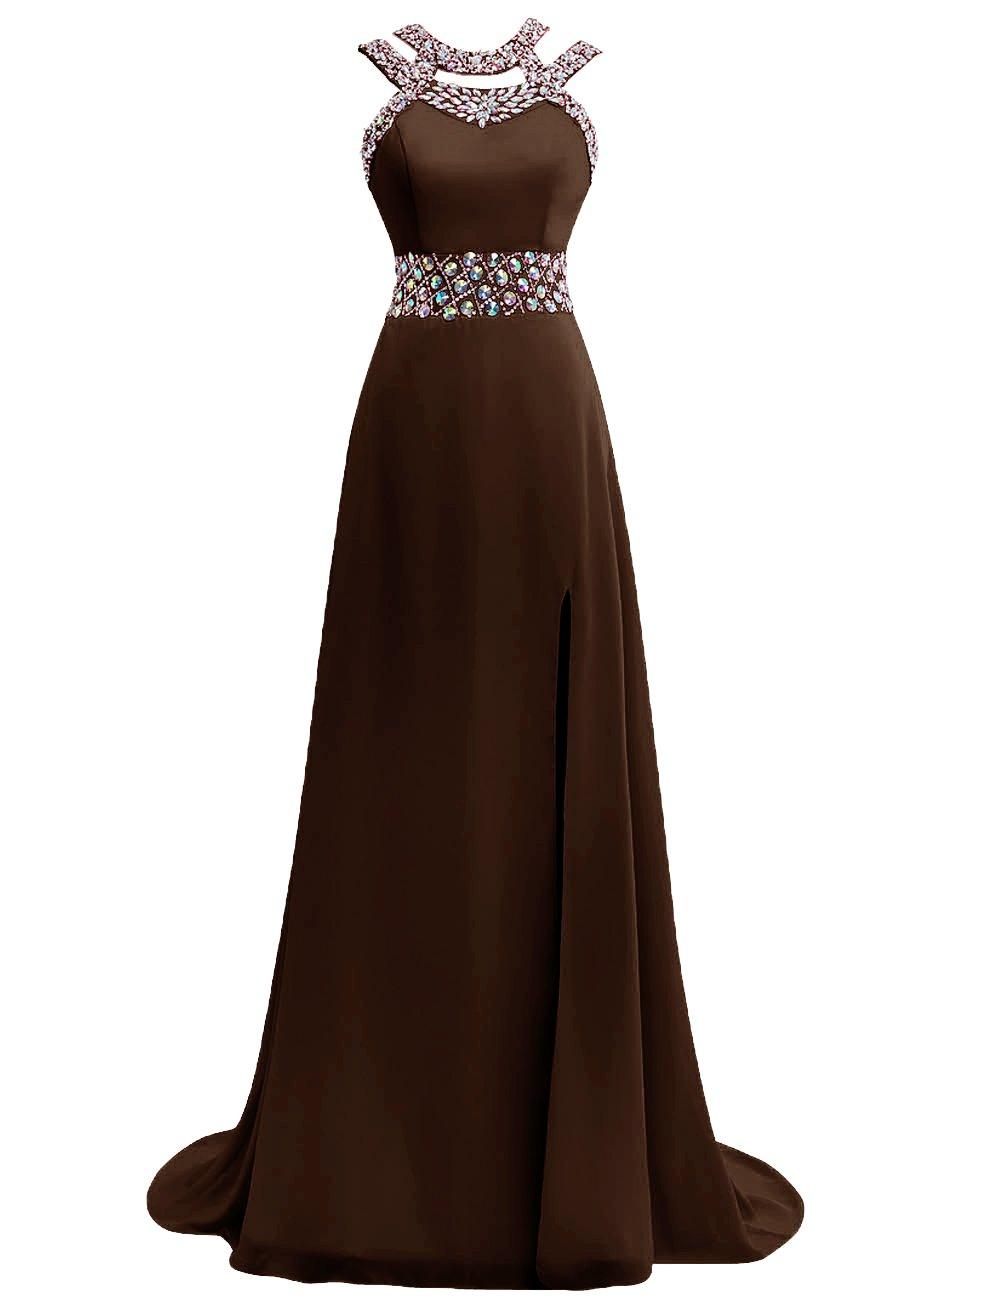 JAEDEN Long Prom Dresses Chiffon Bridesmaid Dress Beaded Formal Evening Dress With Split Chocolate US14